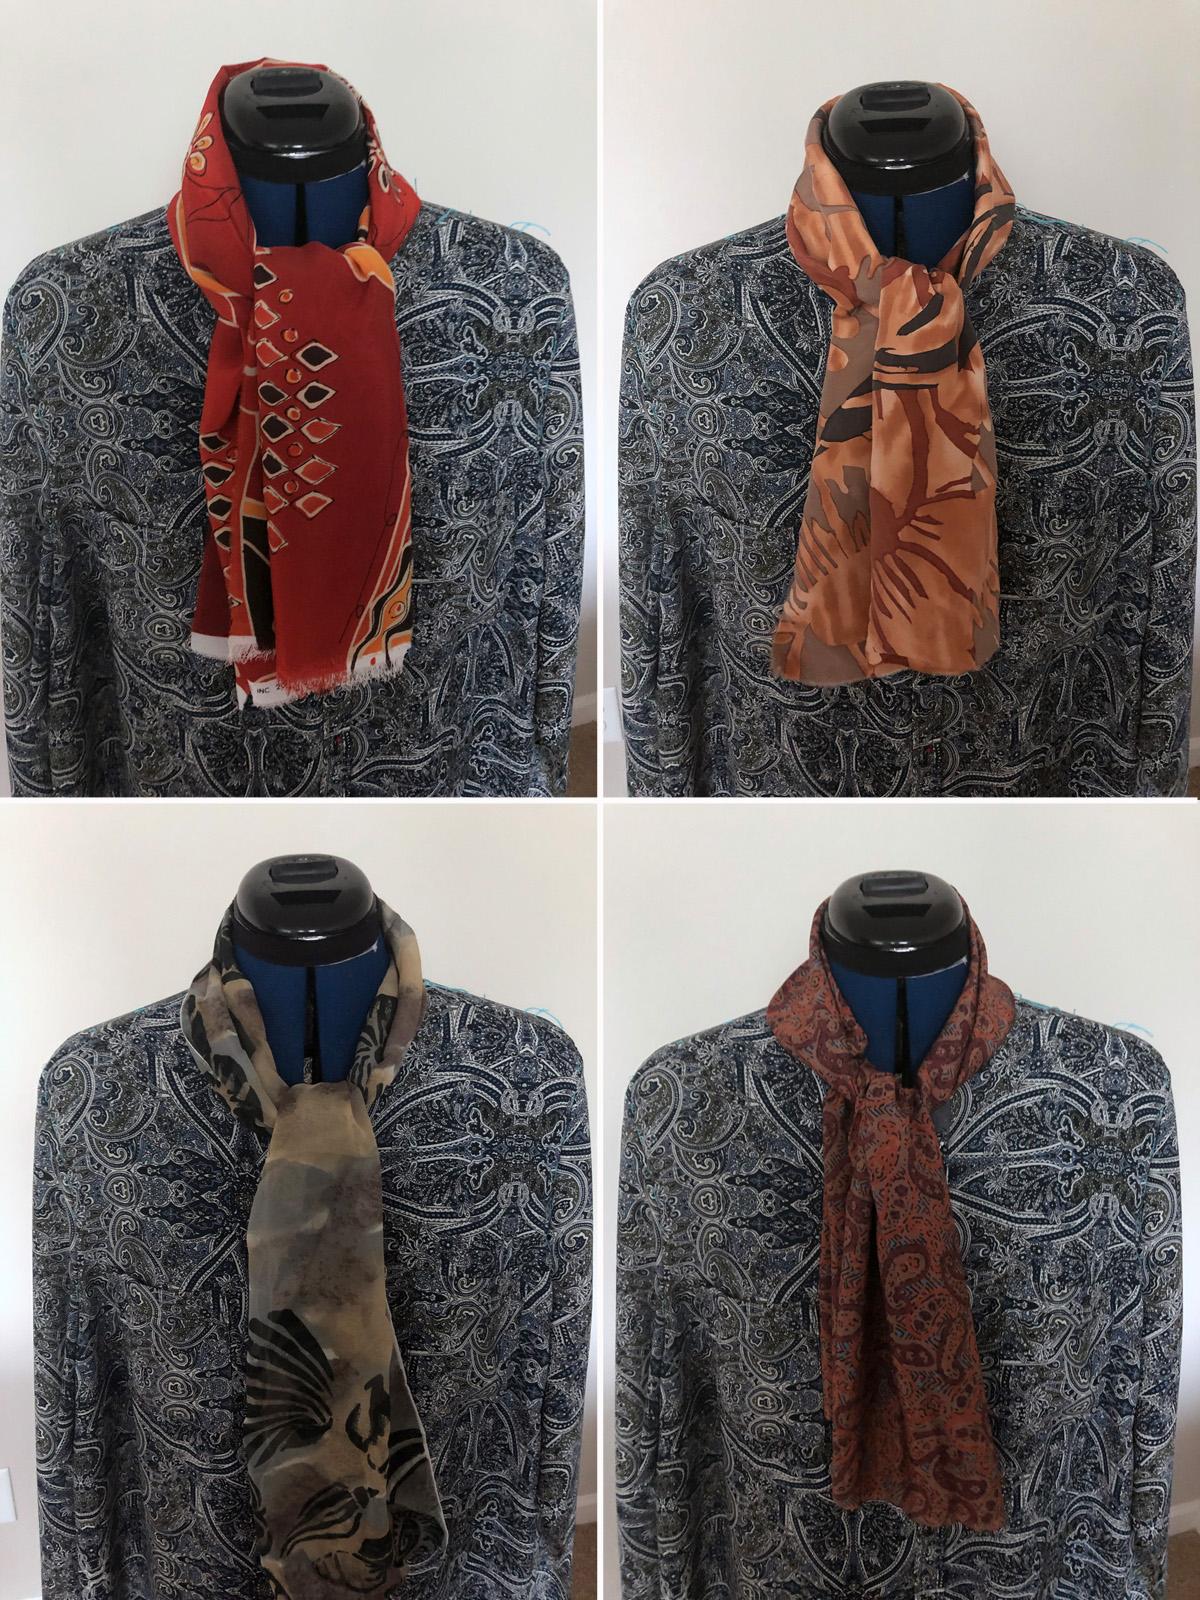 four neckline fabric options for blue paisley blouse